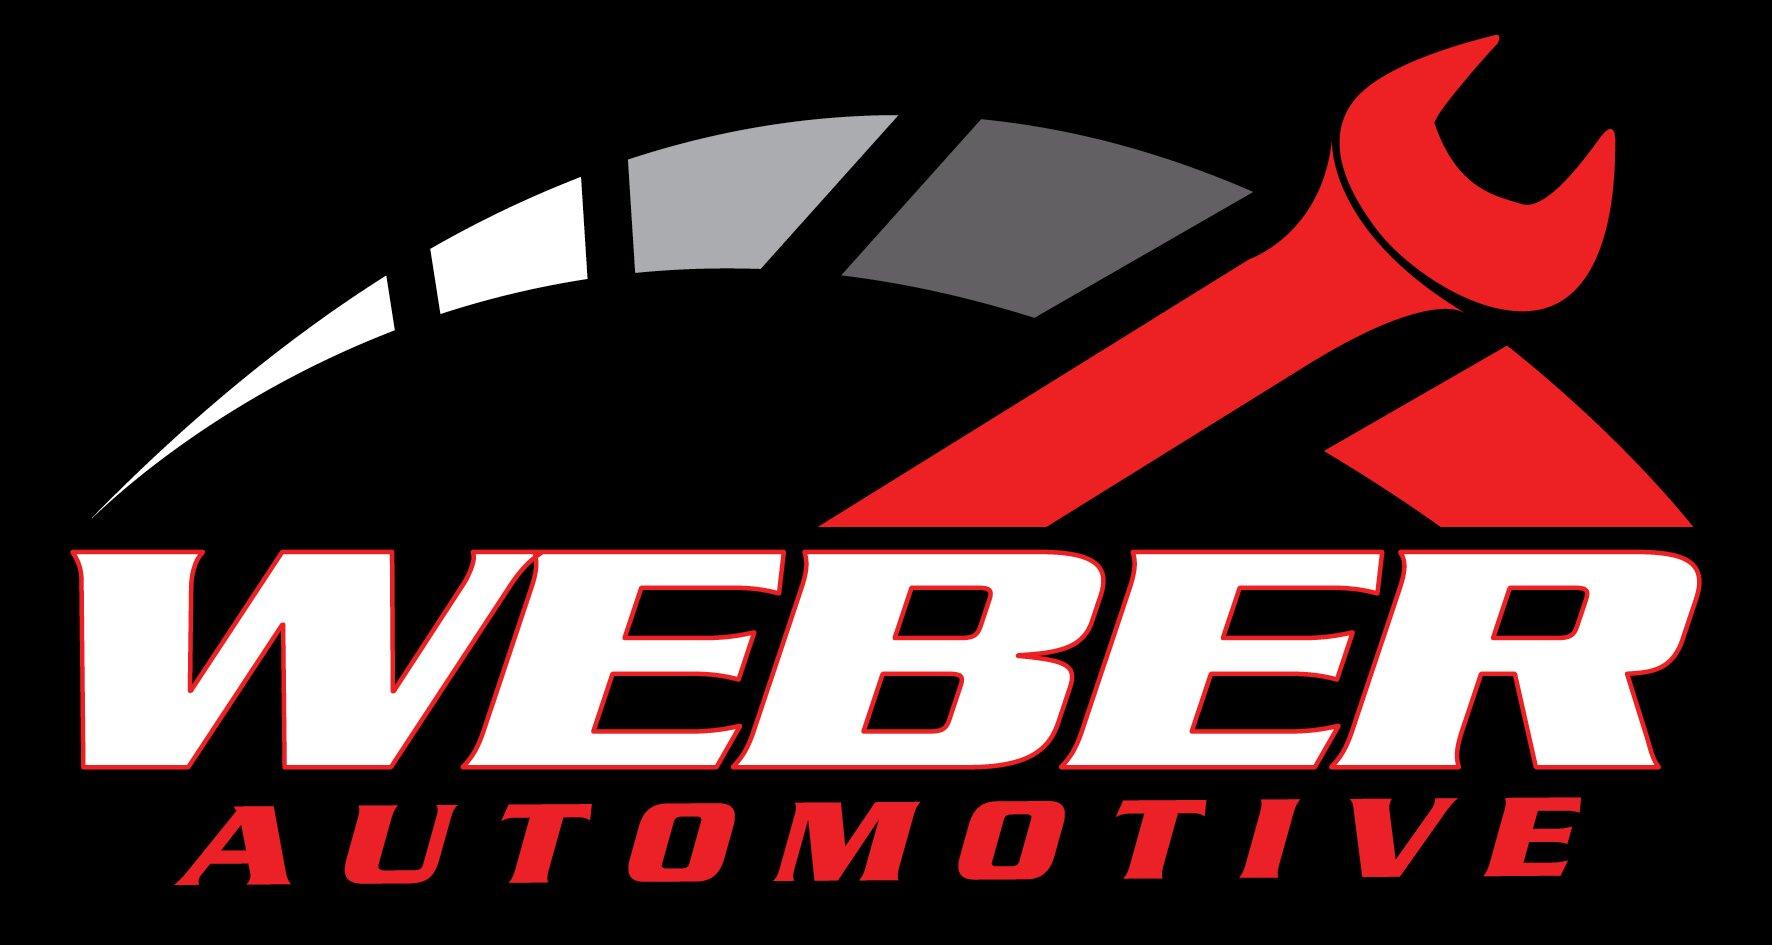 weber automotive weberautomotiv3 twitter